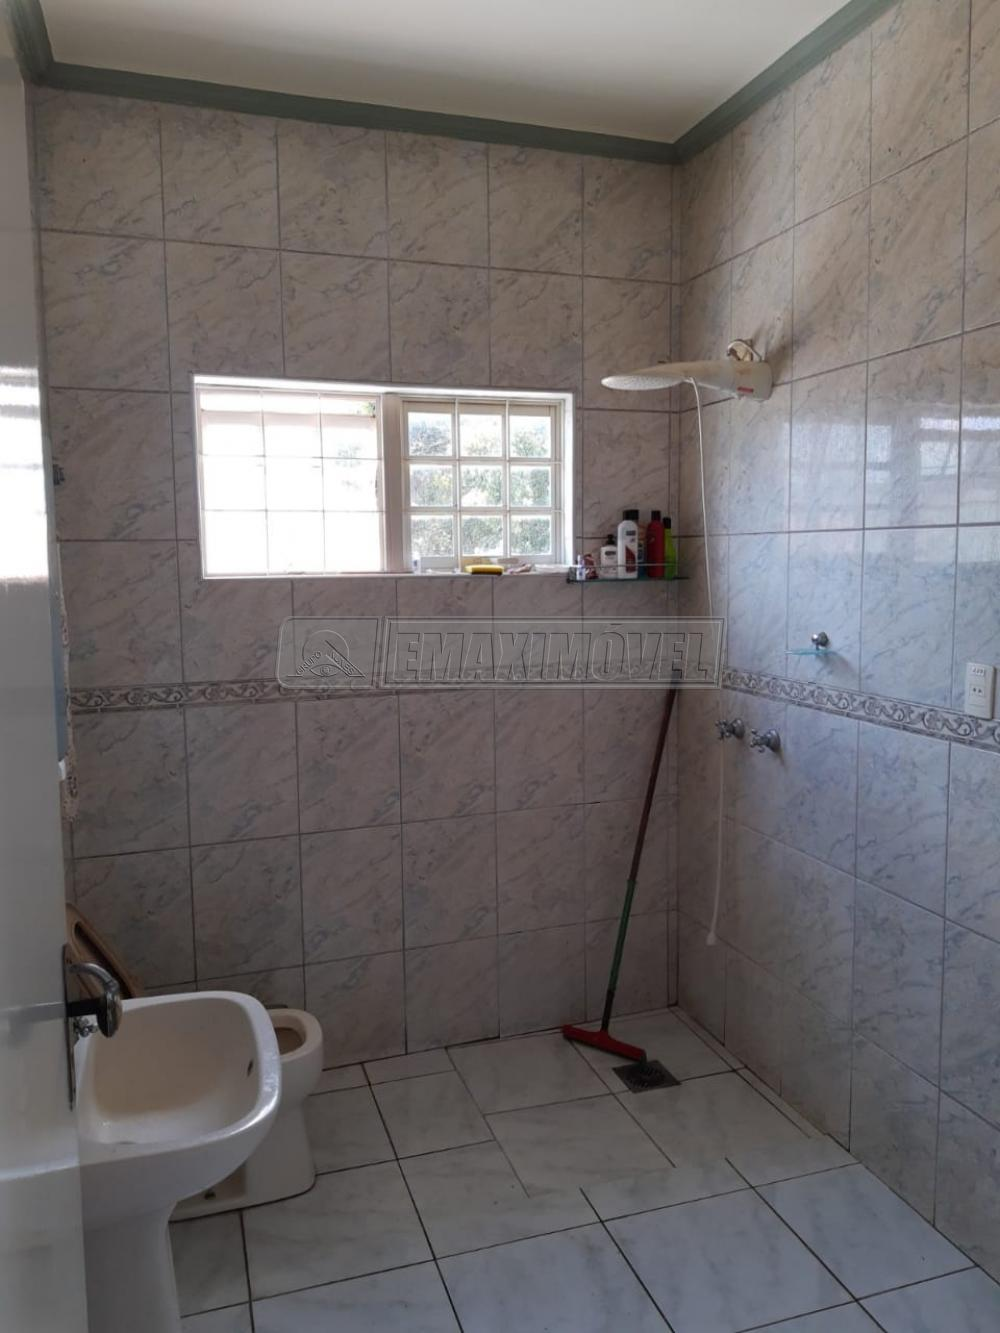 Comprar Casa / Finalidade Comercial em Sorocaba R$ 3.180.000,00 - Foto 14